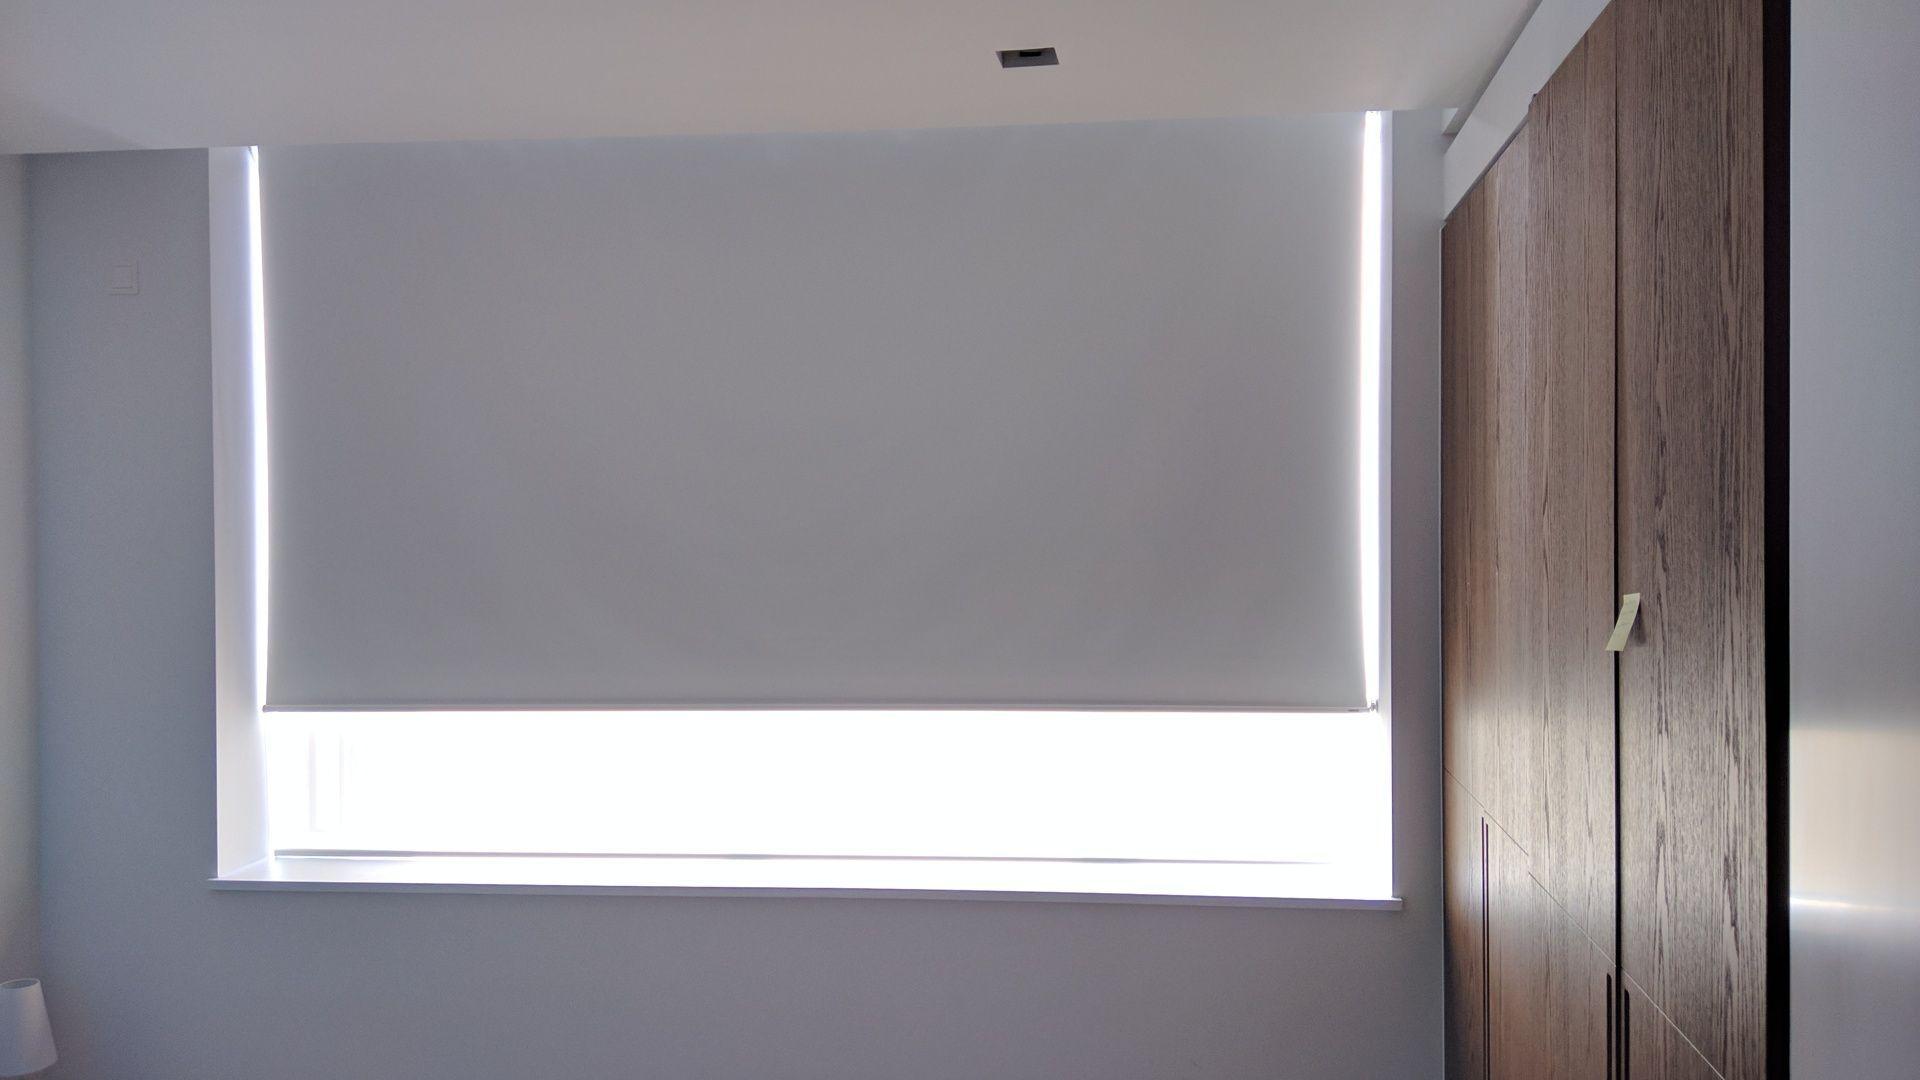 Double Dual Roller Blinds Blackout Roller Blind And Sunscreen Roller Blind For Bedroom Window White Modern Blinds Curtains With Blinds Sliding Door Blinds